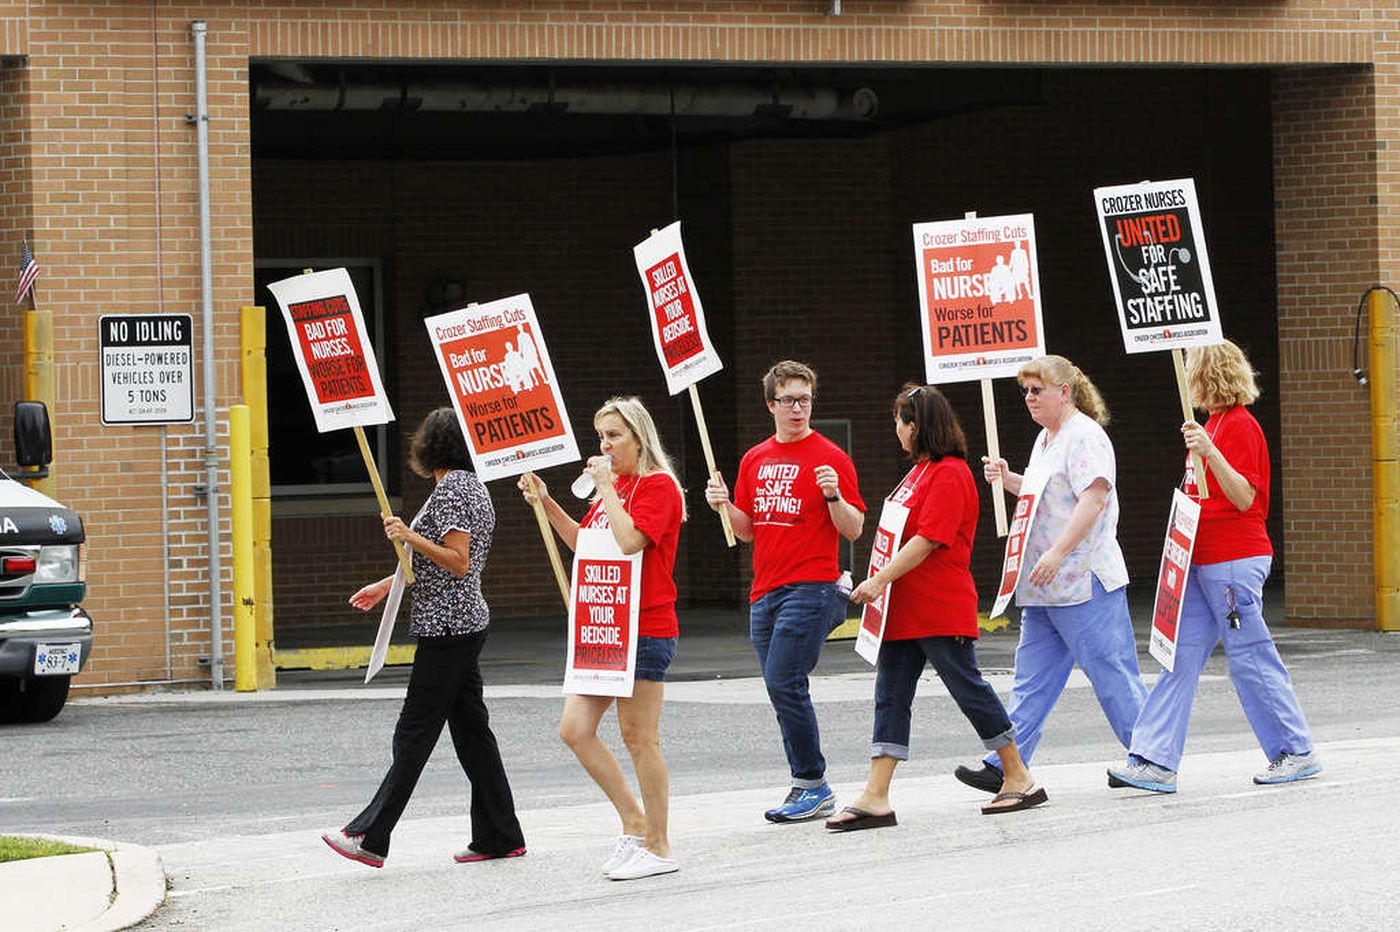 NLRB sets hearing over Crozer nurses' strike